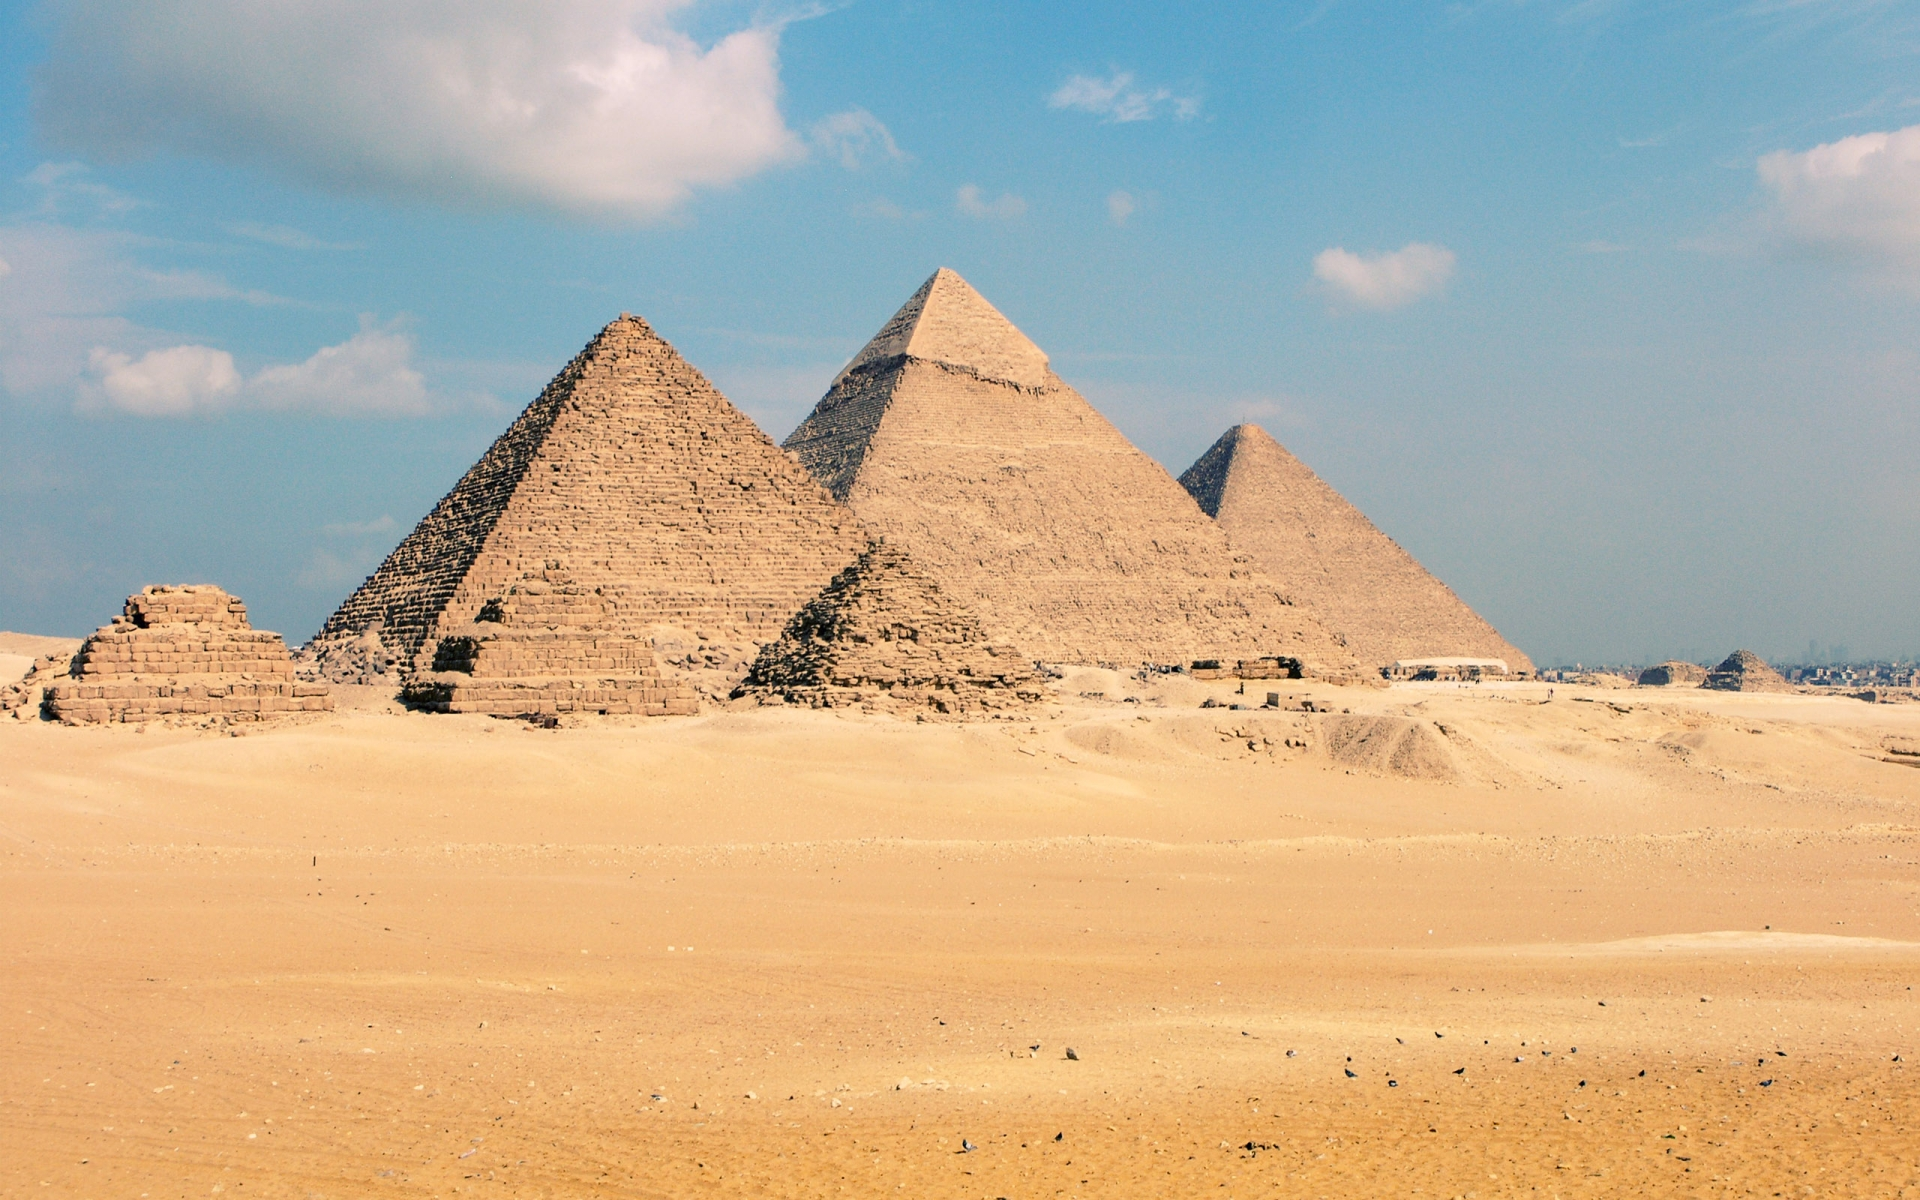 Great Sphinx, Chephren Pyramid, Giza, Egypt  № 2245289 загрузить